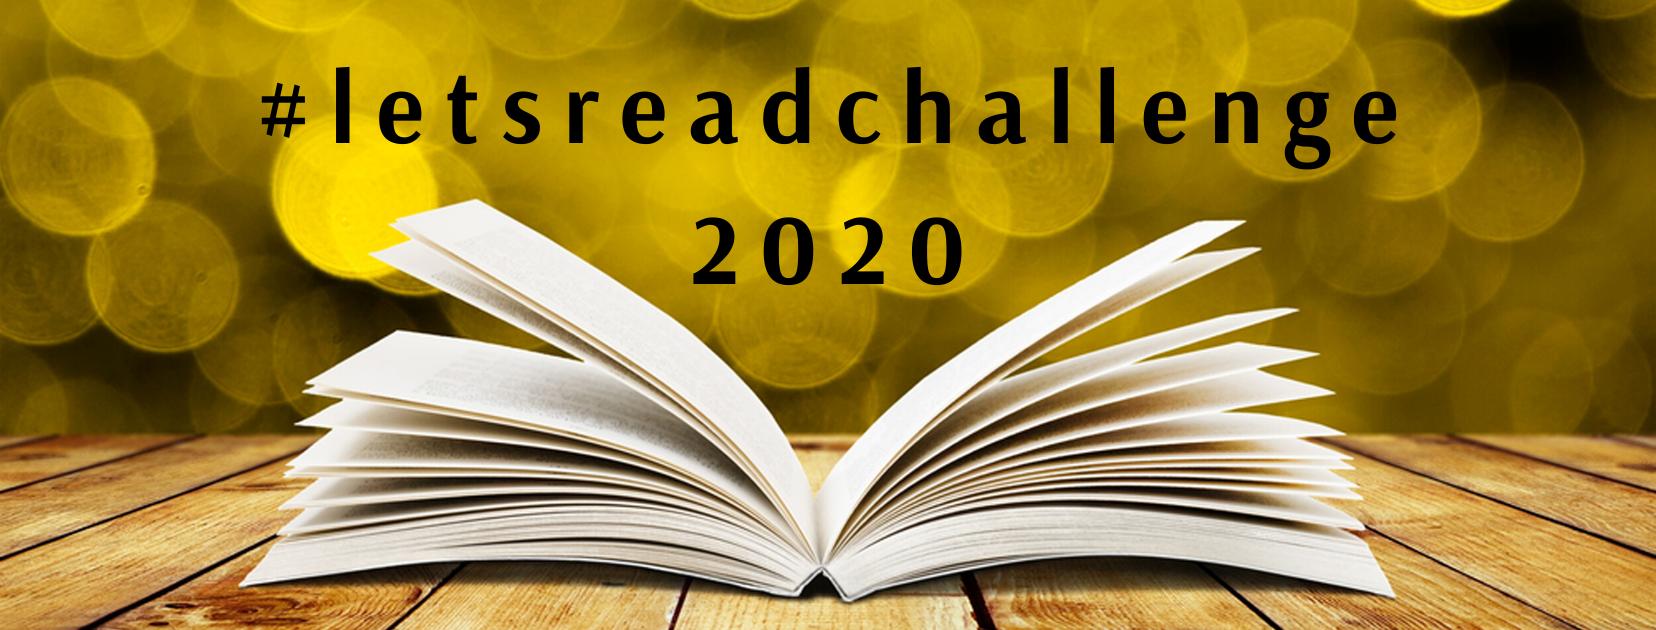 #letsreadchallenge 2020